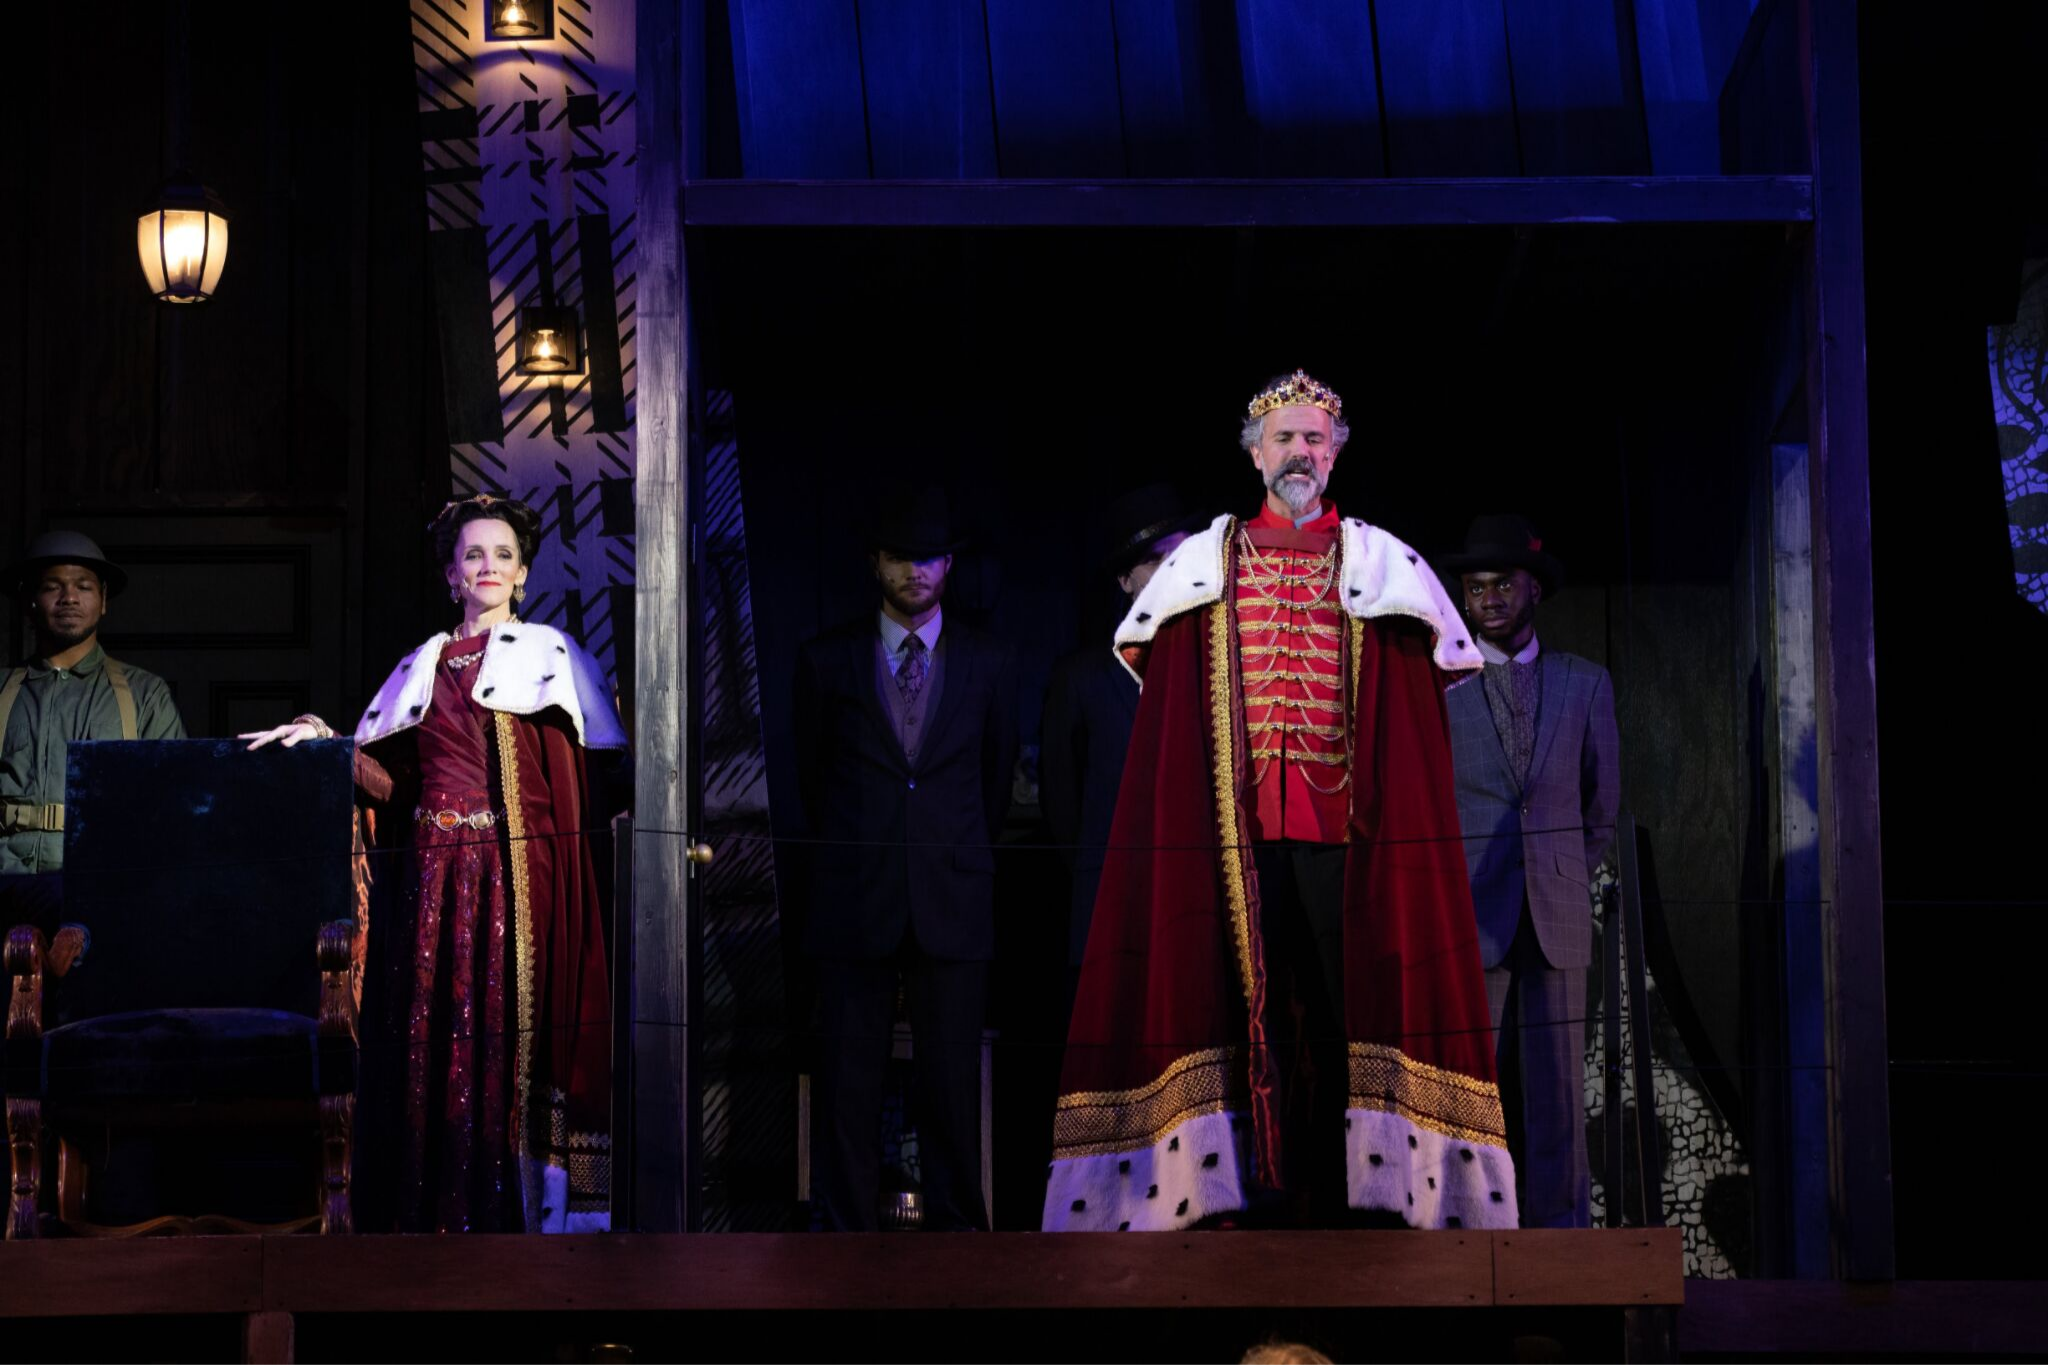 Jeanine Kane (Queen) and Tony Estrella (King Cymbeline) in Cymbeline, Shakespeare on the Common 2019-Photo by Evgenia Eliseeva